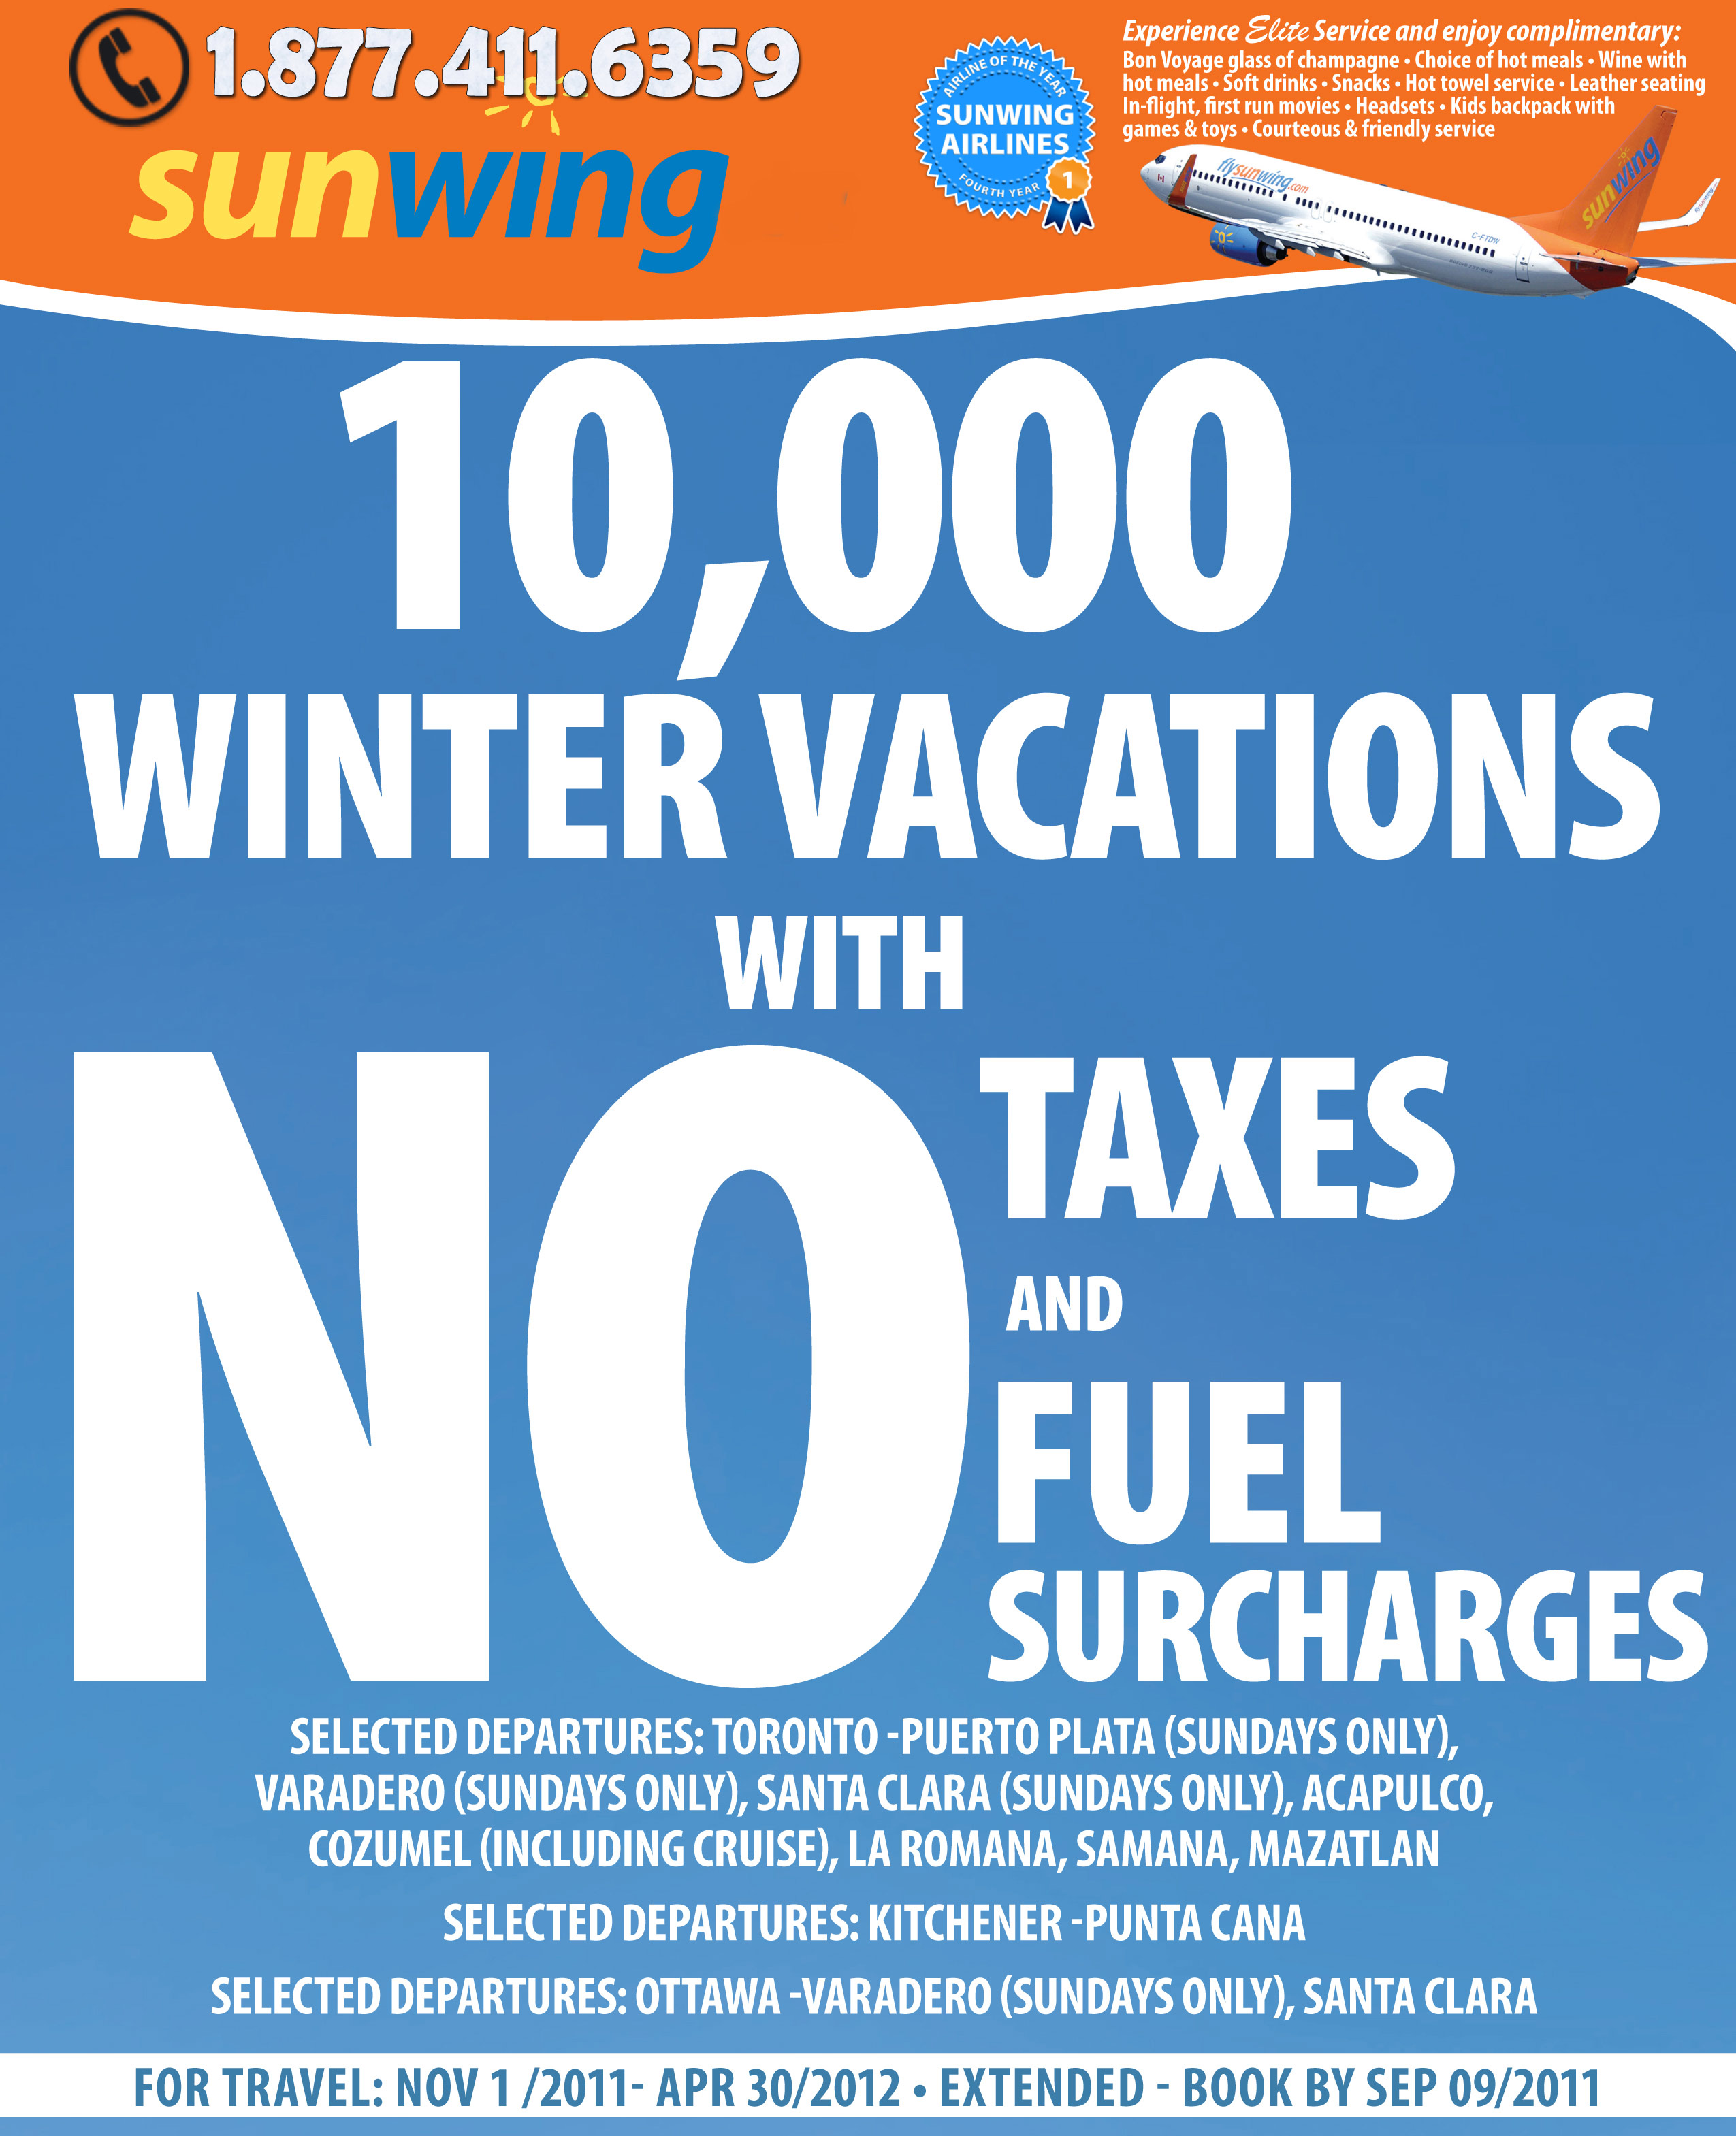 Sunwing Specials - Winter Vacation deals to Dream Destinations